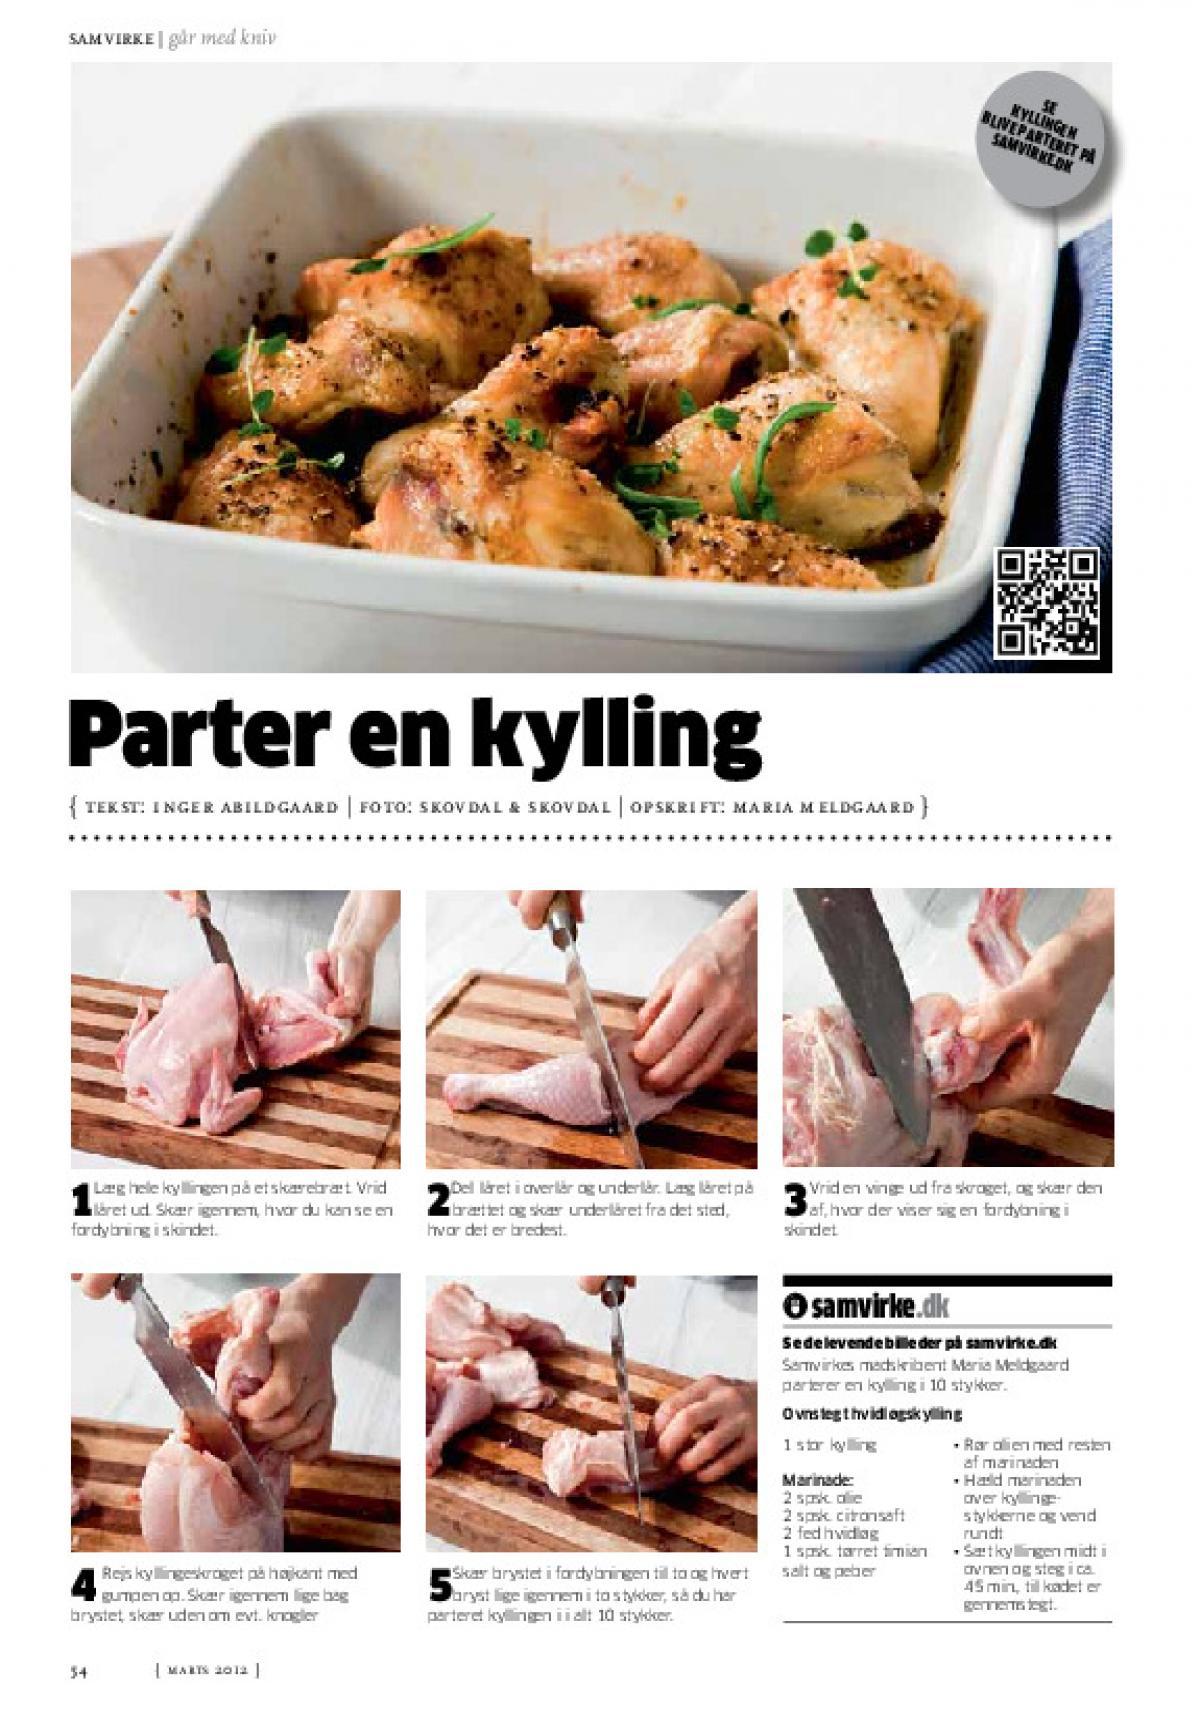 parter kylling